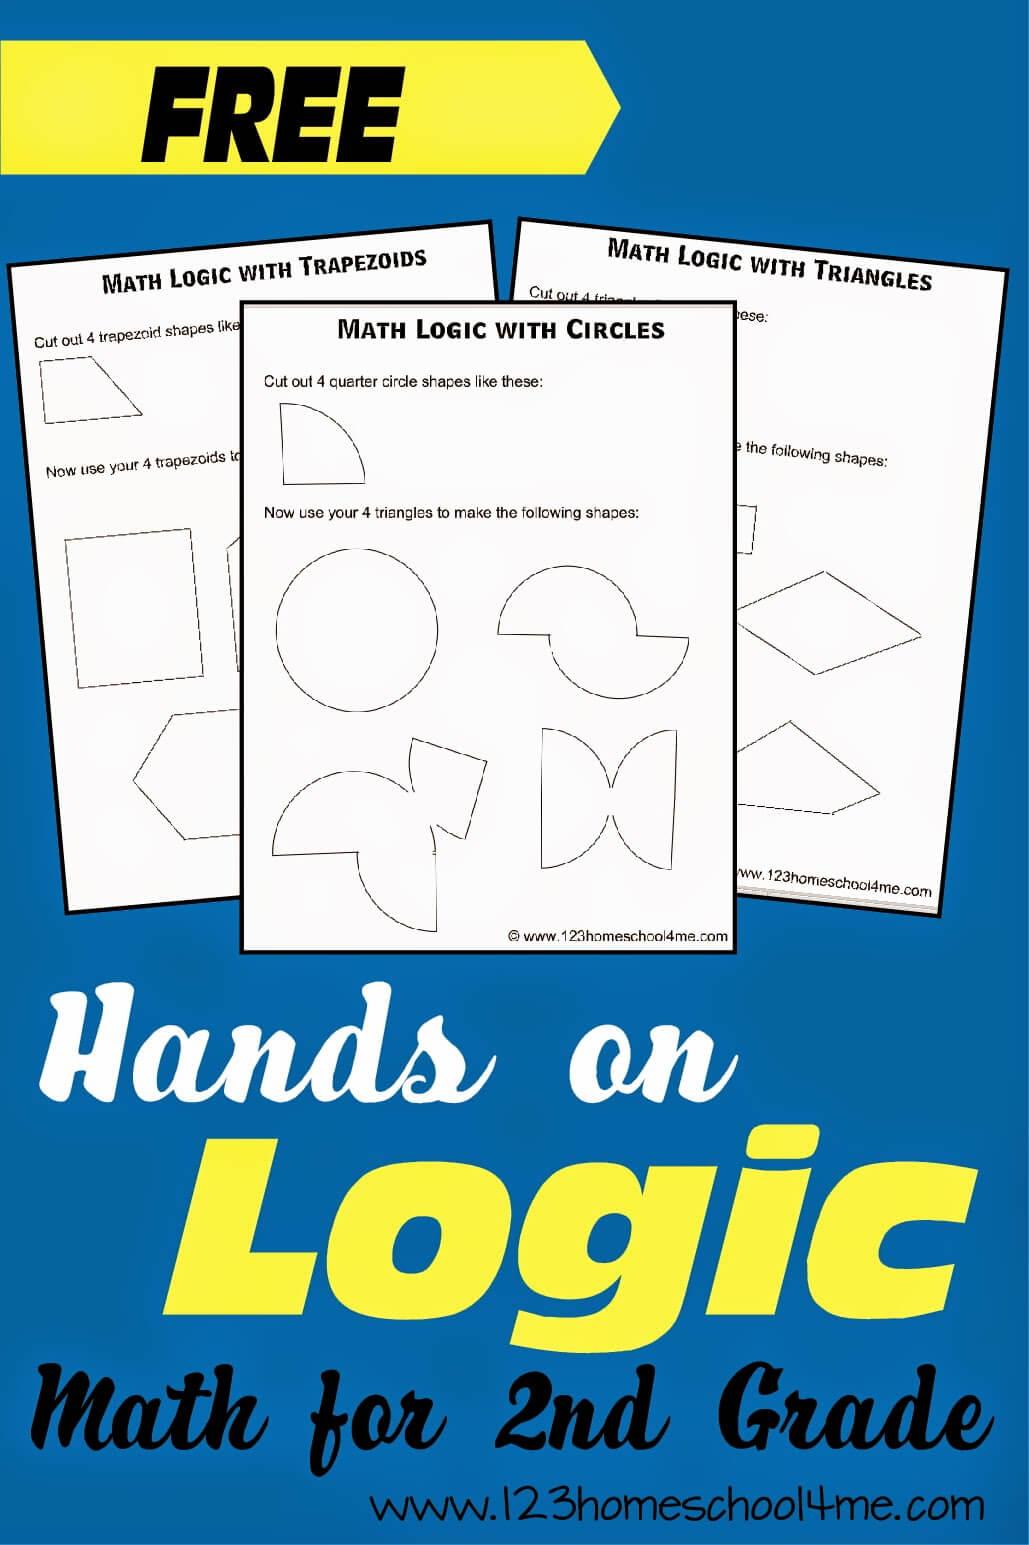 Shape Logic Problems for 2nd Grade Math